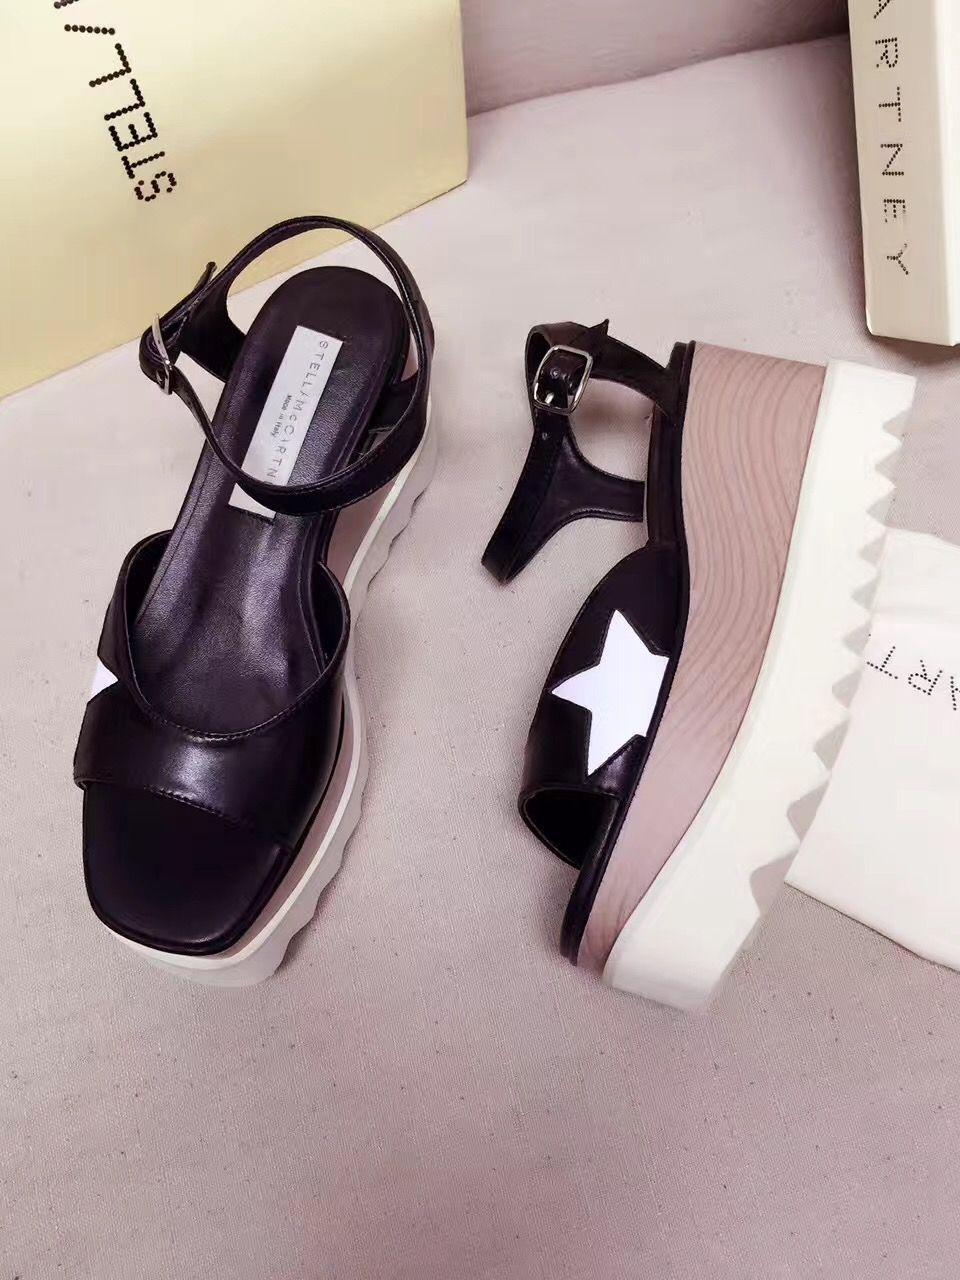 55c66926d0af 2017 Summer Stella Mccartney Star Sandals Genuine Leather Elyse Platform Women  Shoes Sandals For Women Knee High Gladiator Sandals From Luischen